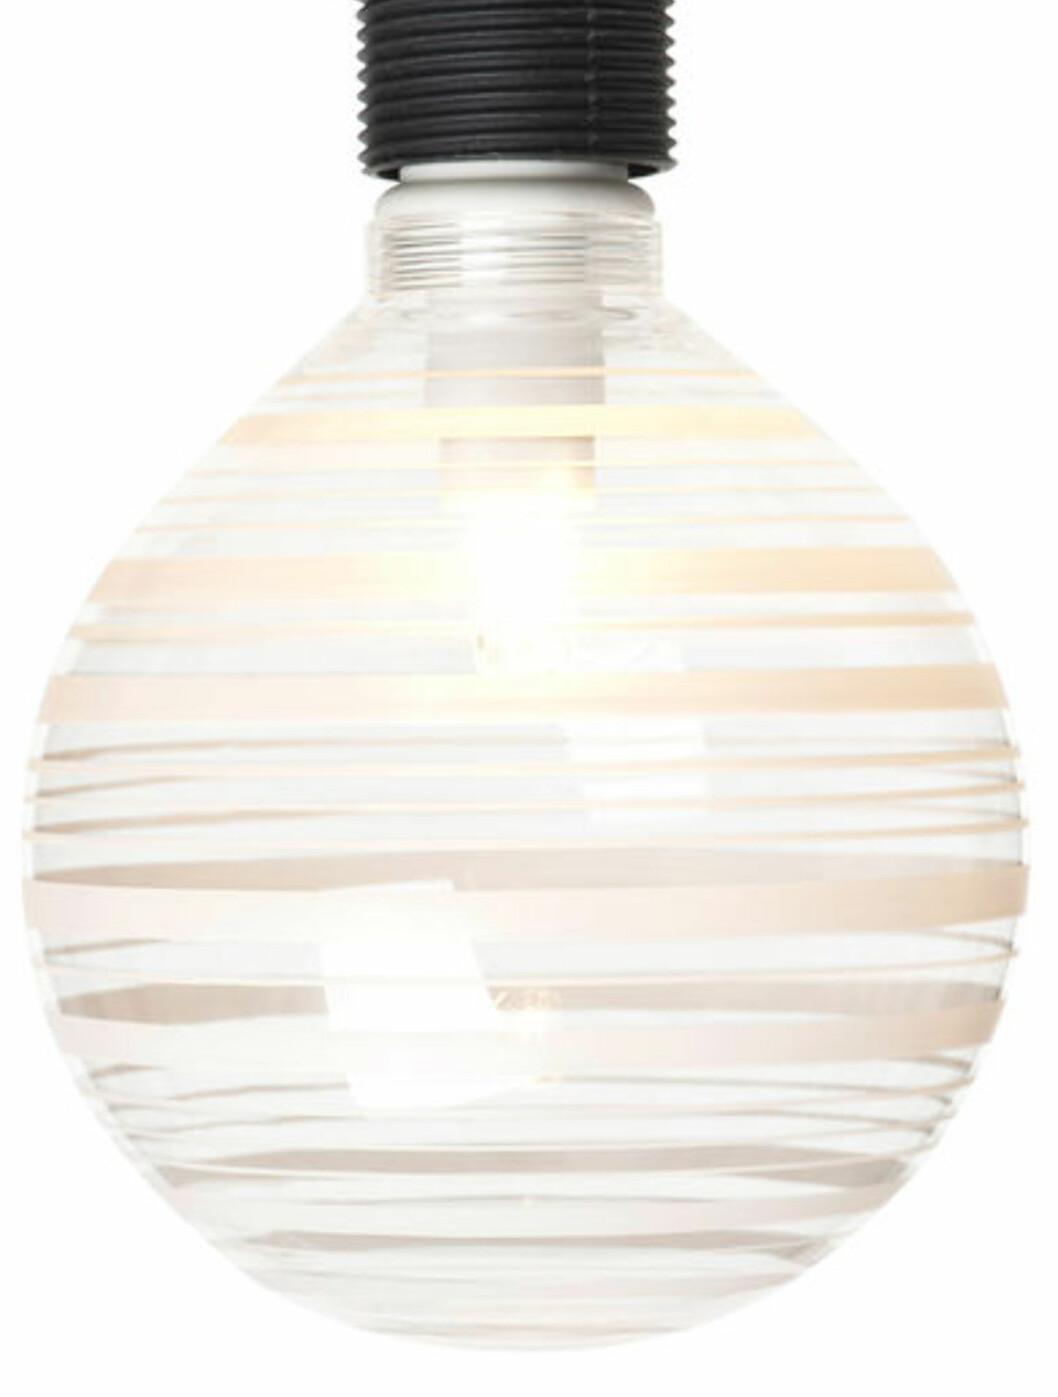 <strong><b>MØNSTRETE LAMPE:</strong></b> I likhet med Clas Ohlson, har også Rusta slike mønstrete lamper (lyspærer) - i ulike mønster. 12 cm i diameter. Koster 69 kroner hos Rusta. Foto: RUSTA/MATS LILJEDAHL